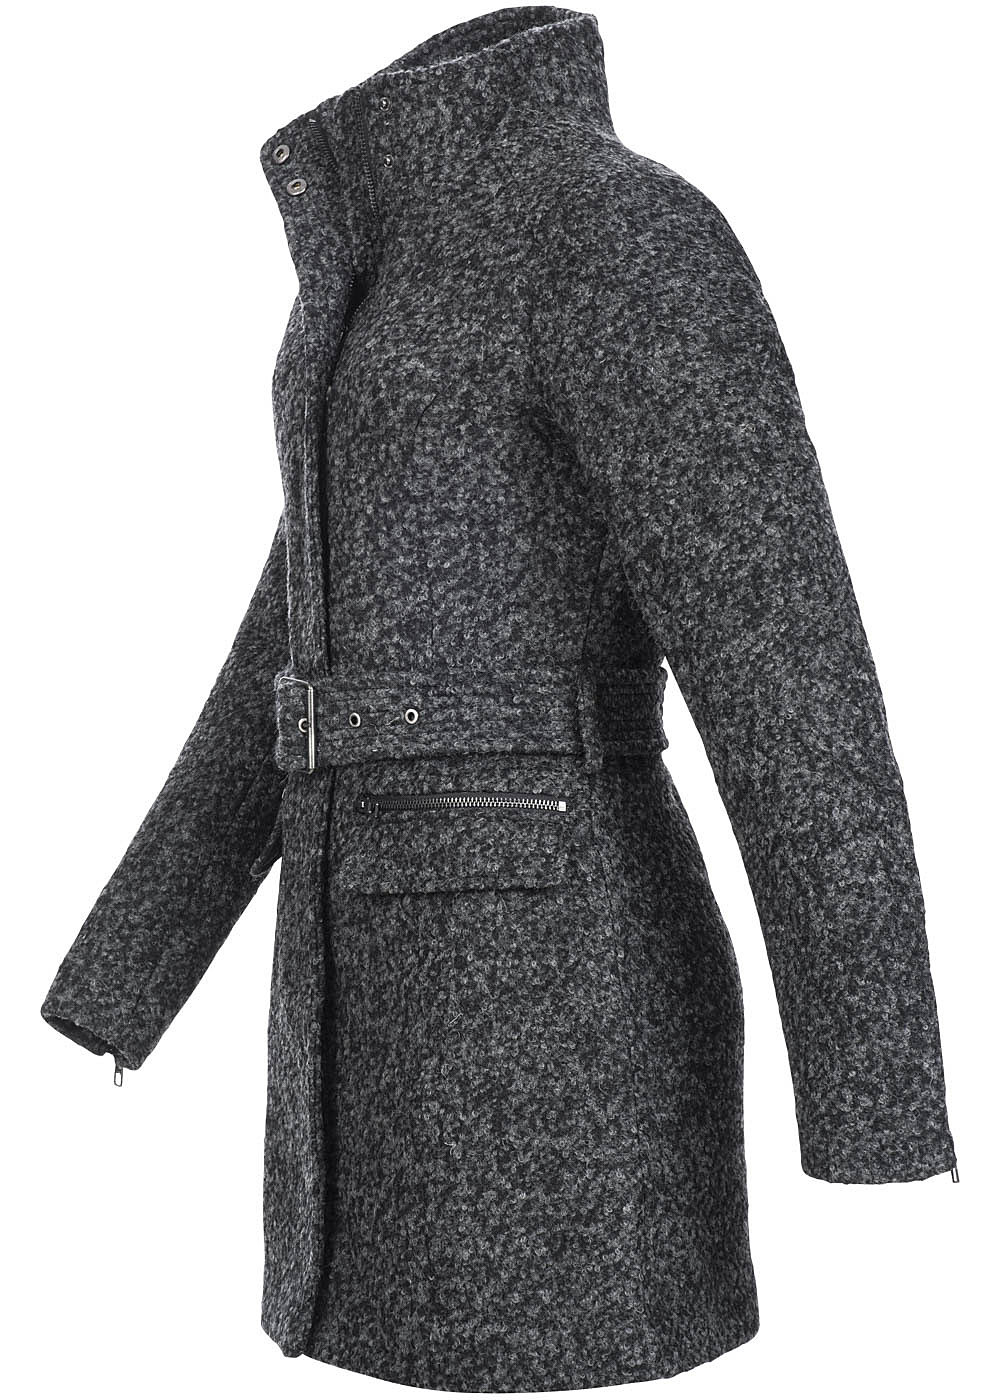 only damen wollmantel alanis 15106673 2 deko taschen g rtel 2 zipper dunkel grau ebay. Black Bedroom Furniture Sets. Home Design Ideas